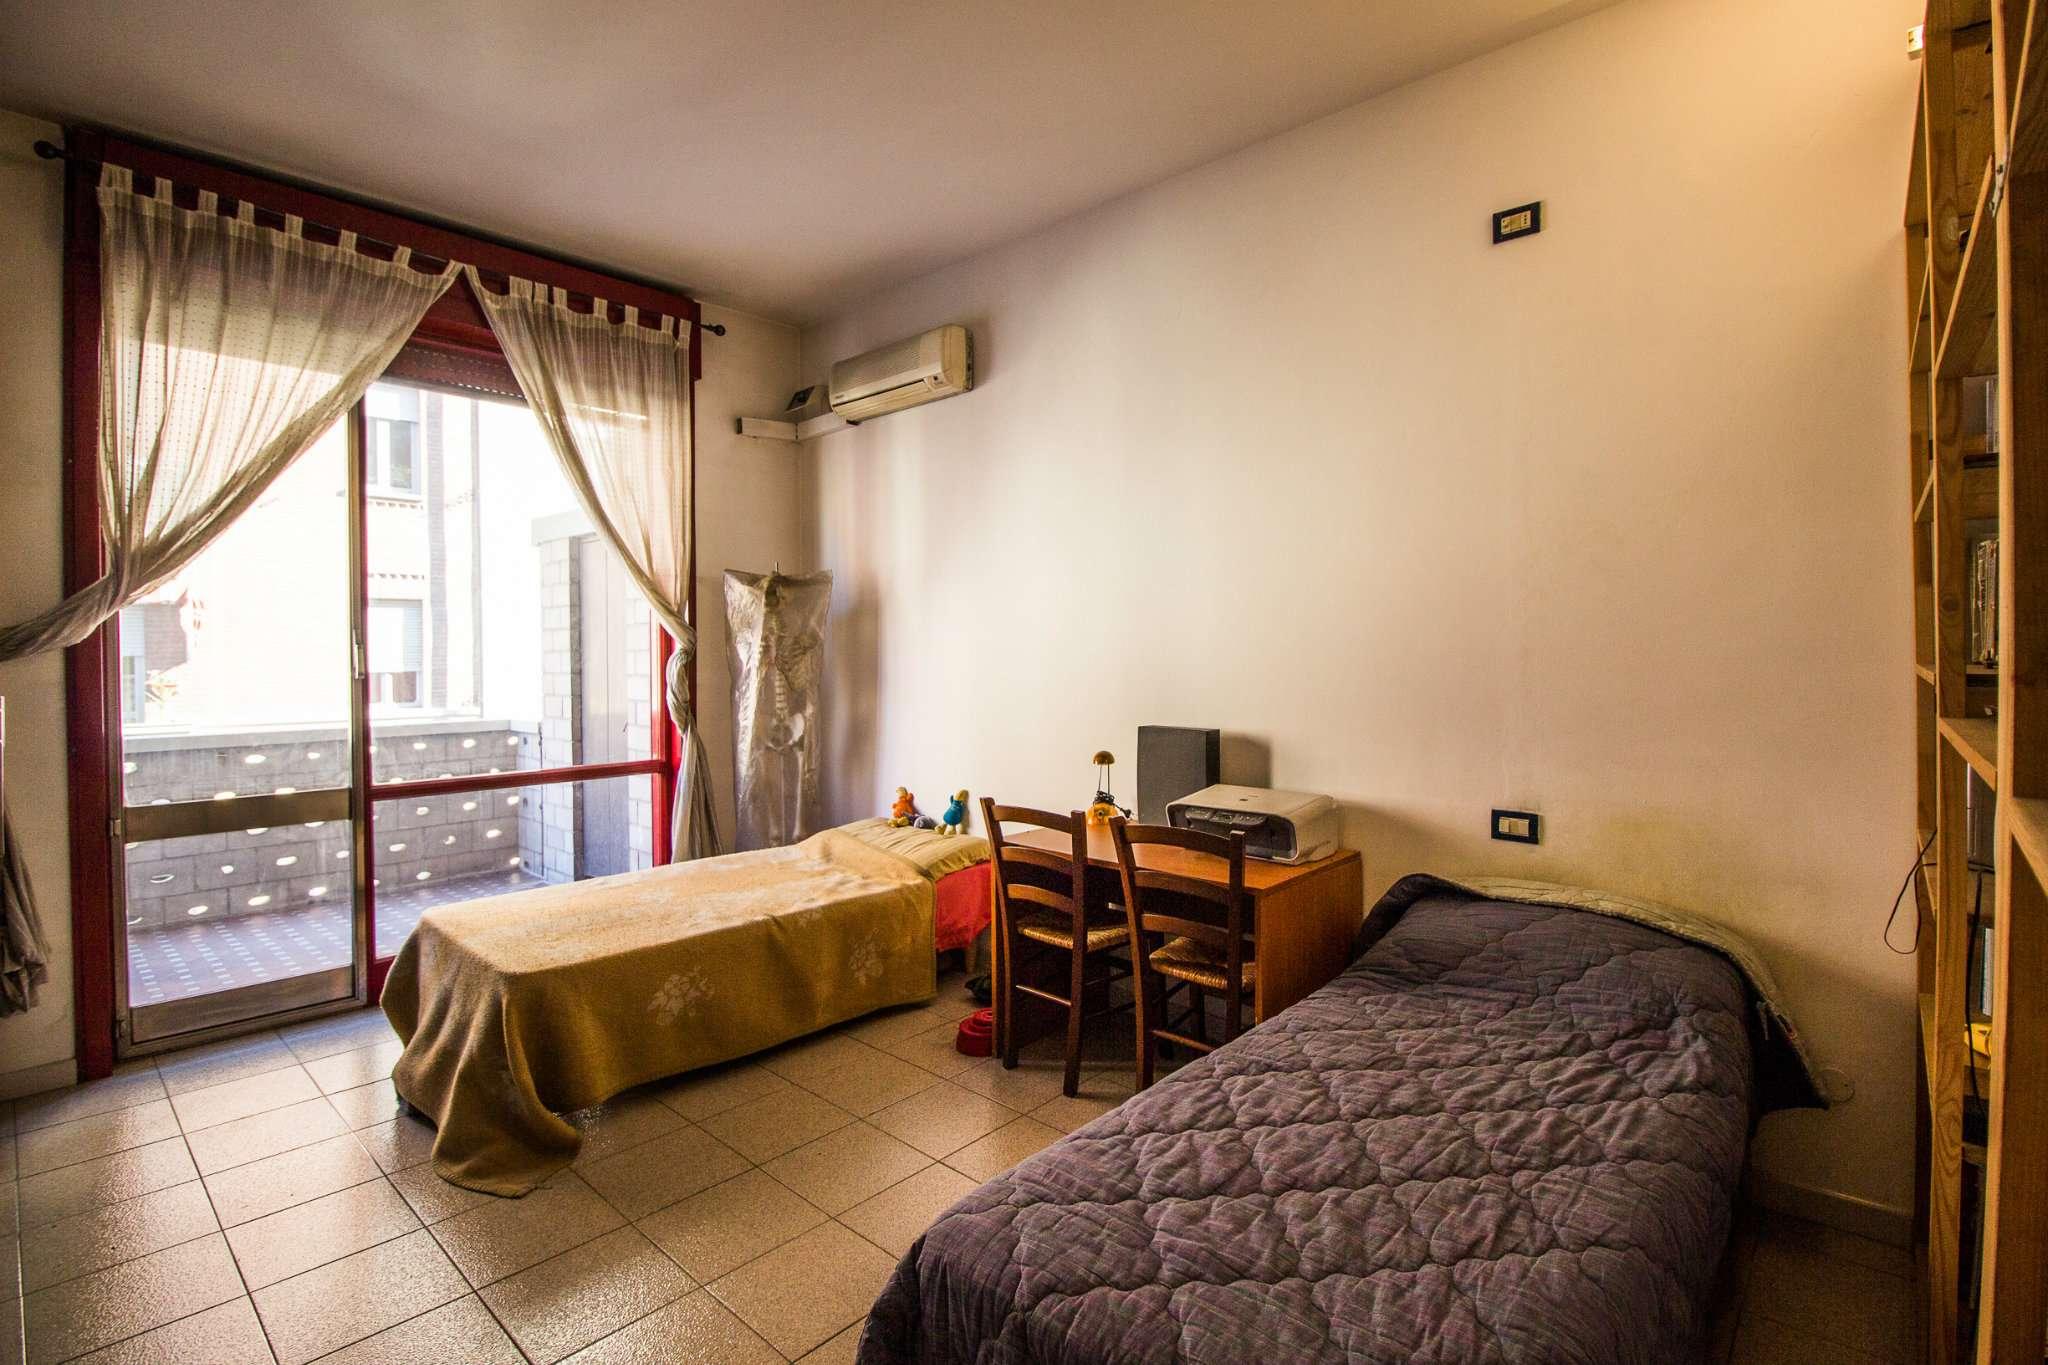 Appartamento in vendita Zona San Salvario - via Ormea 164 Torino